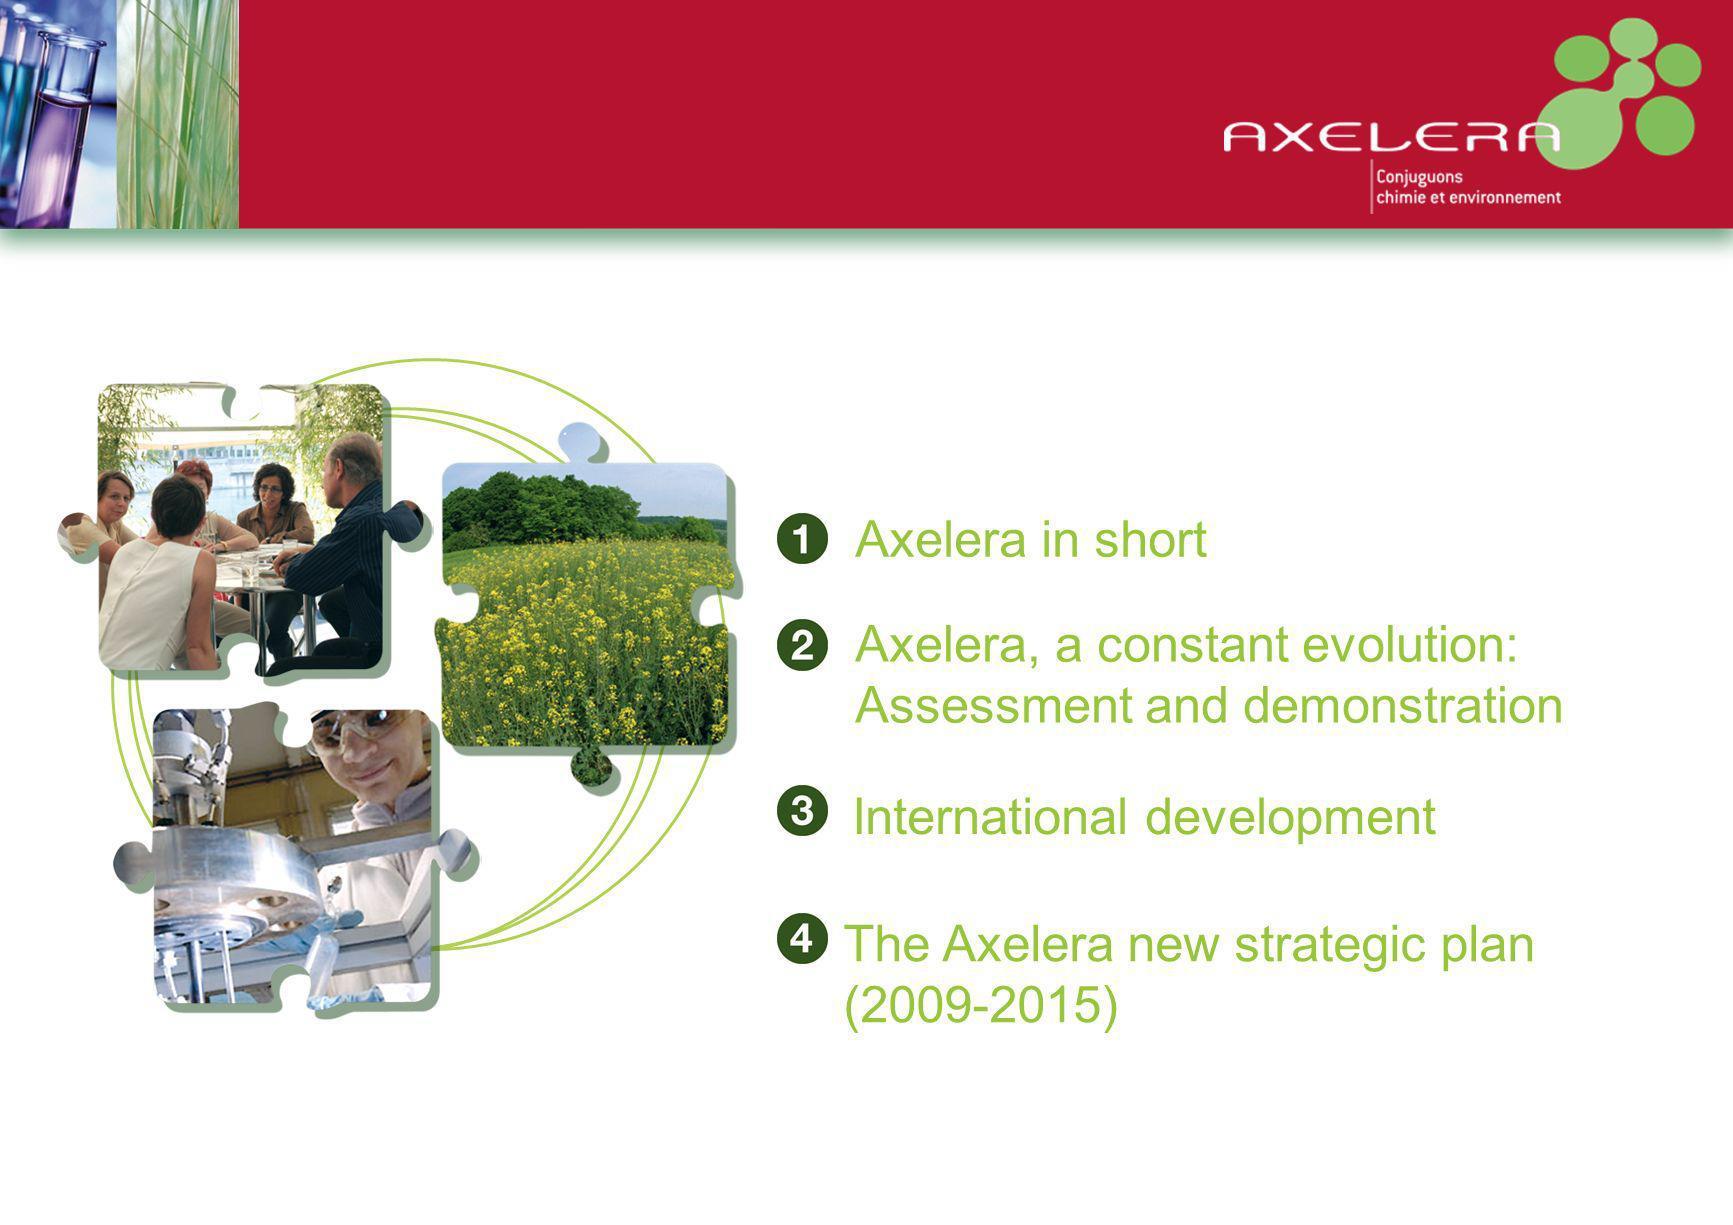 The new strategy of Axelera (2009 – 2015)